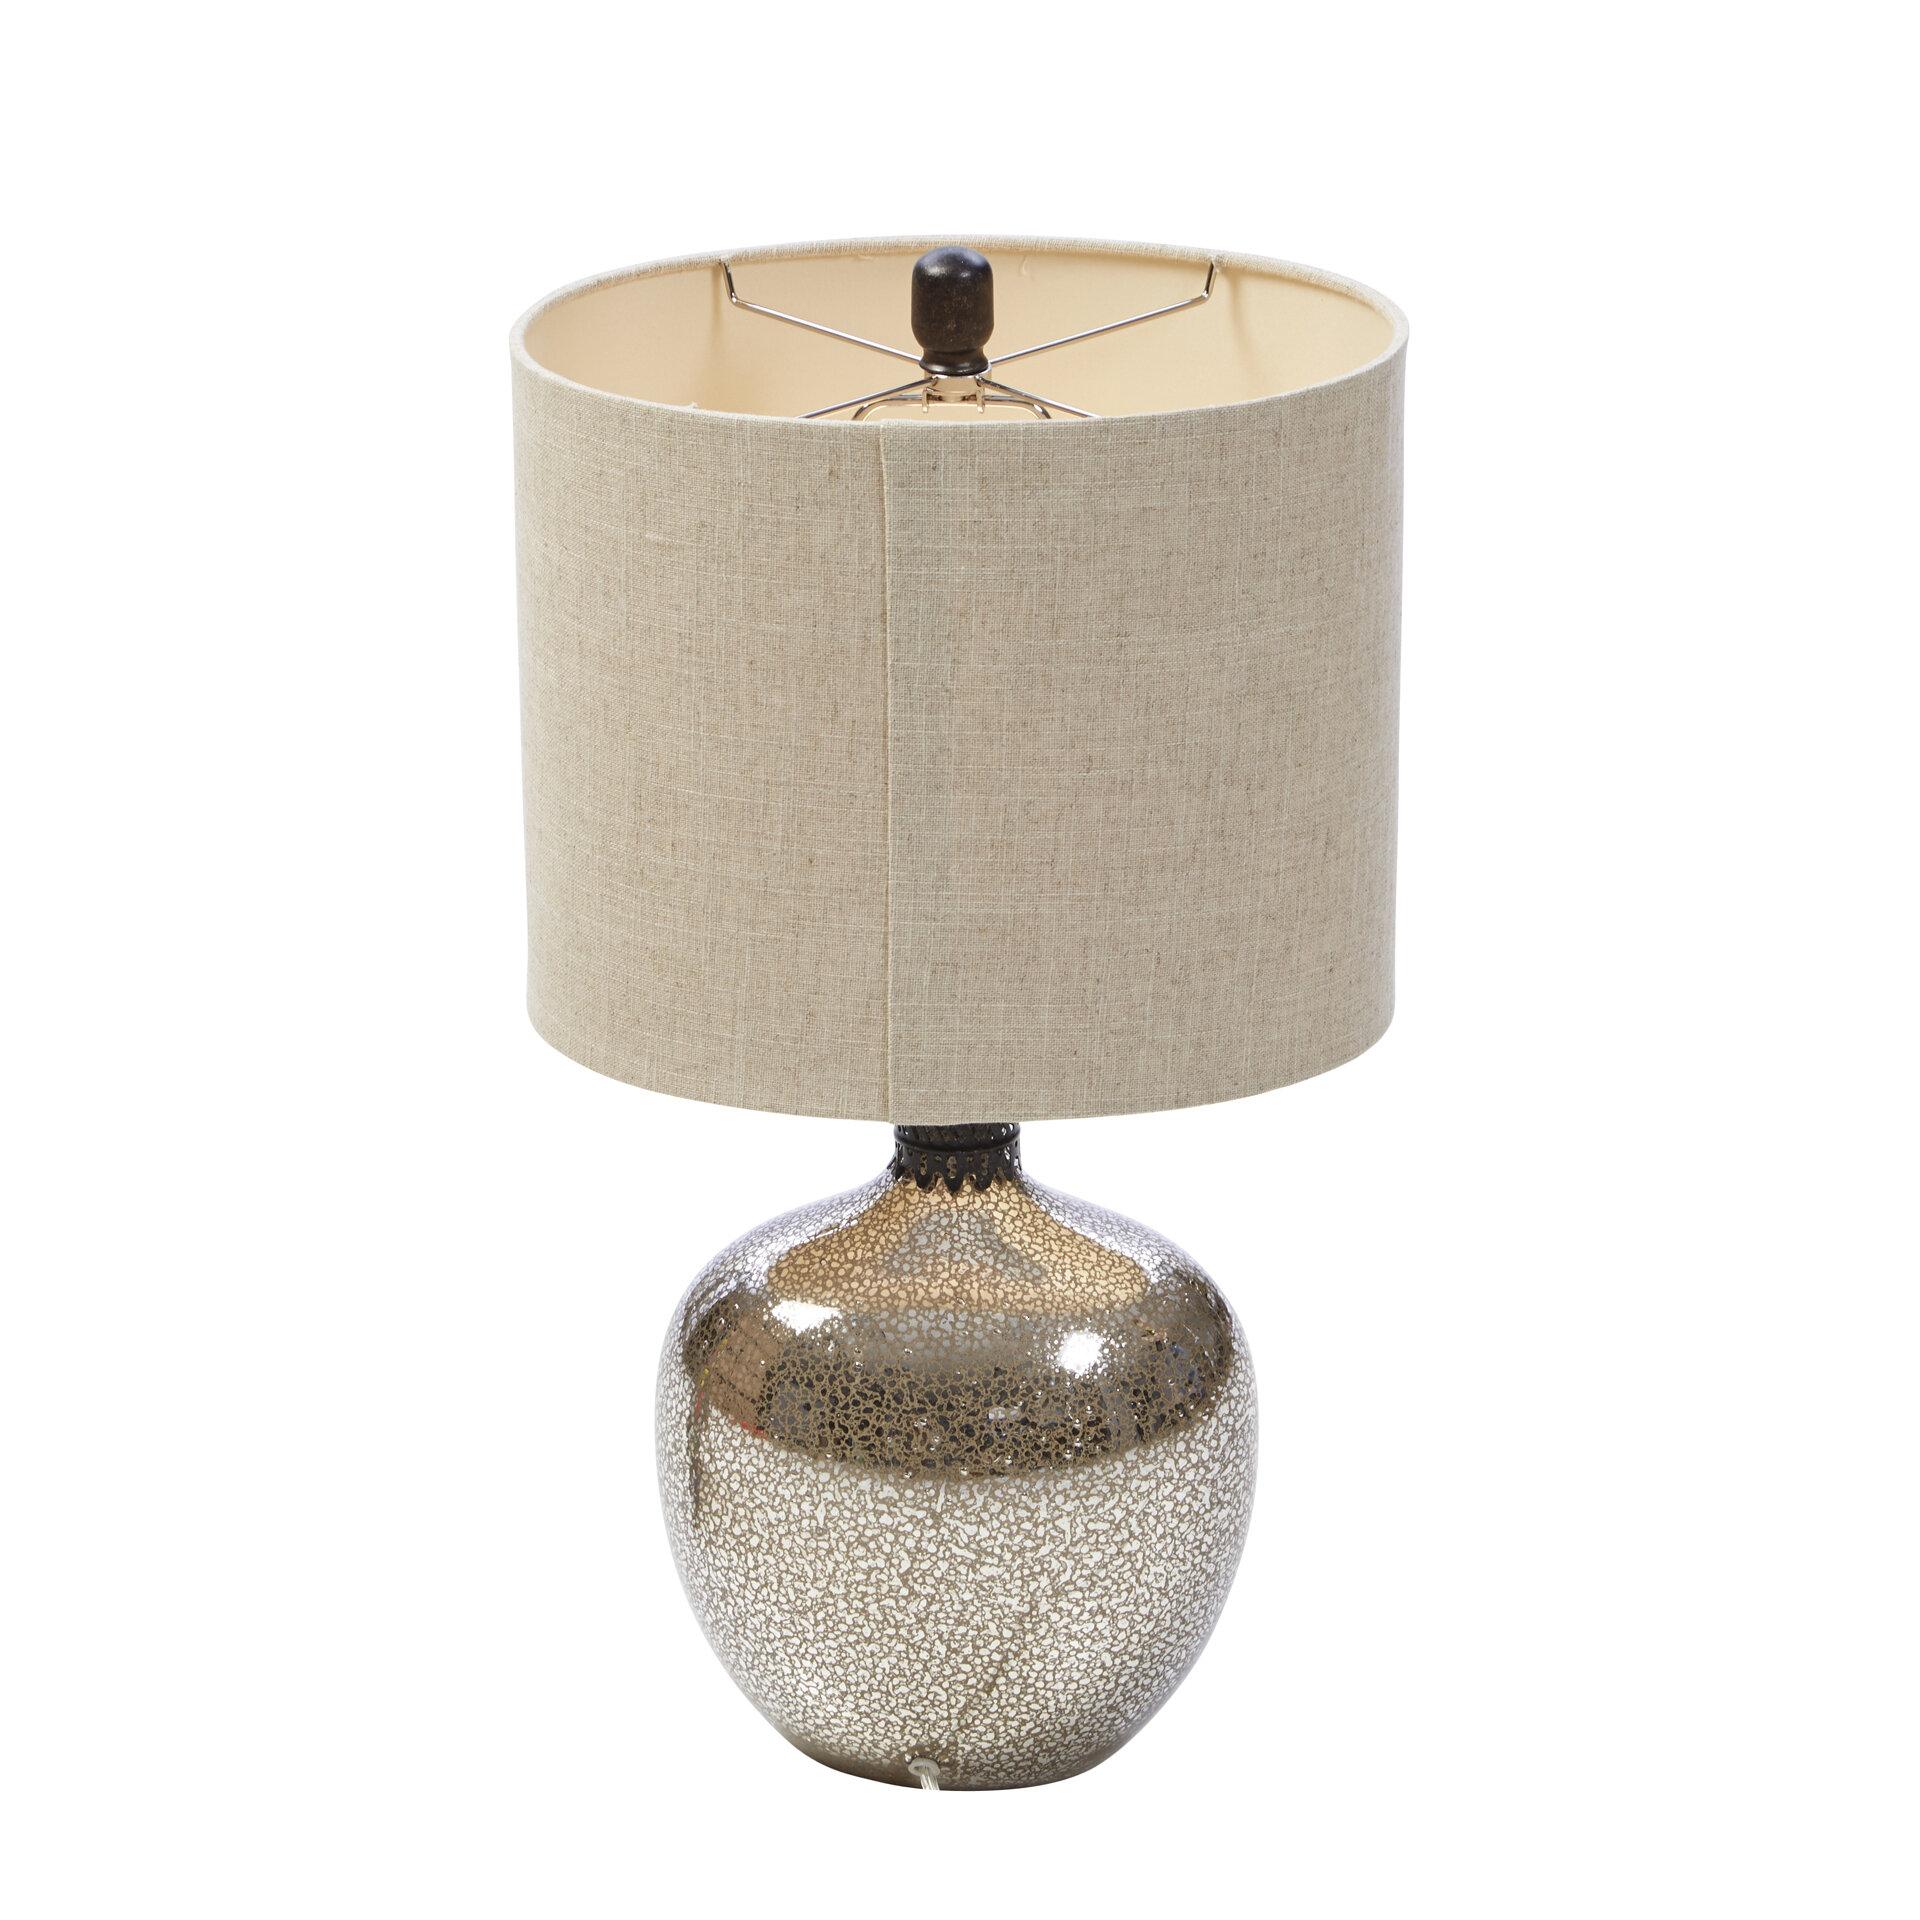 Brittingham 25 5 table lamp reviews joss main